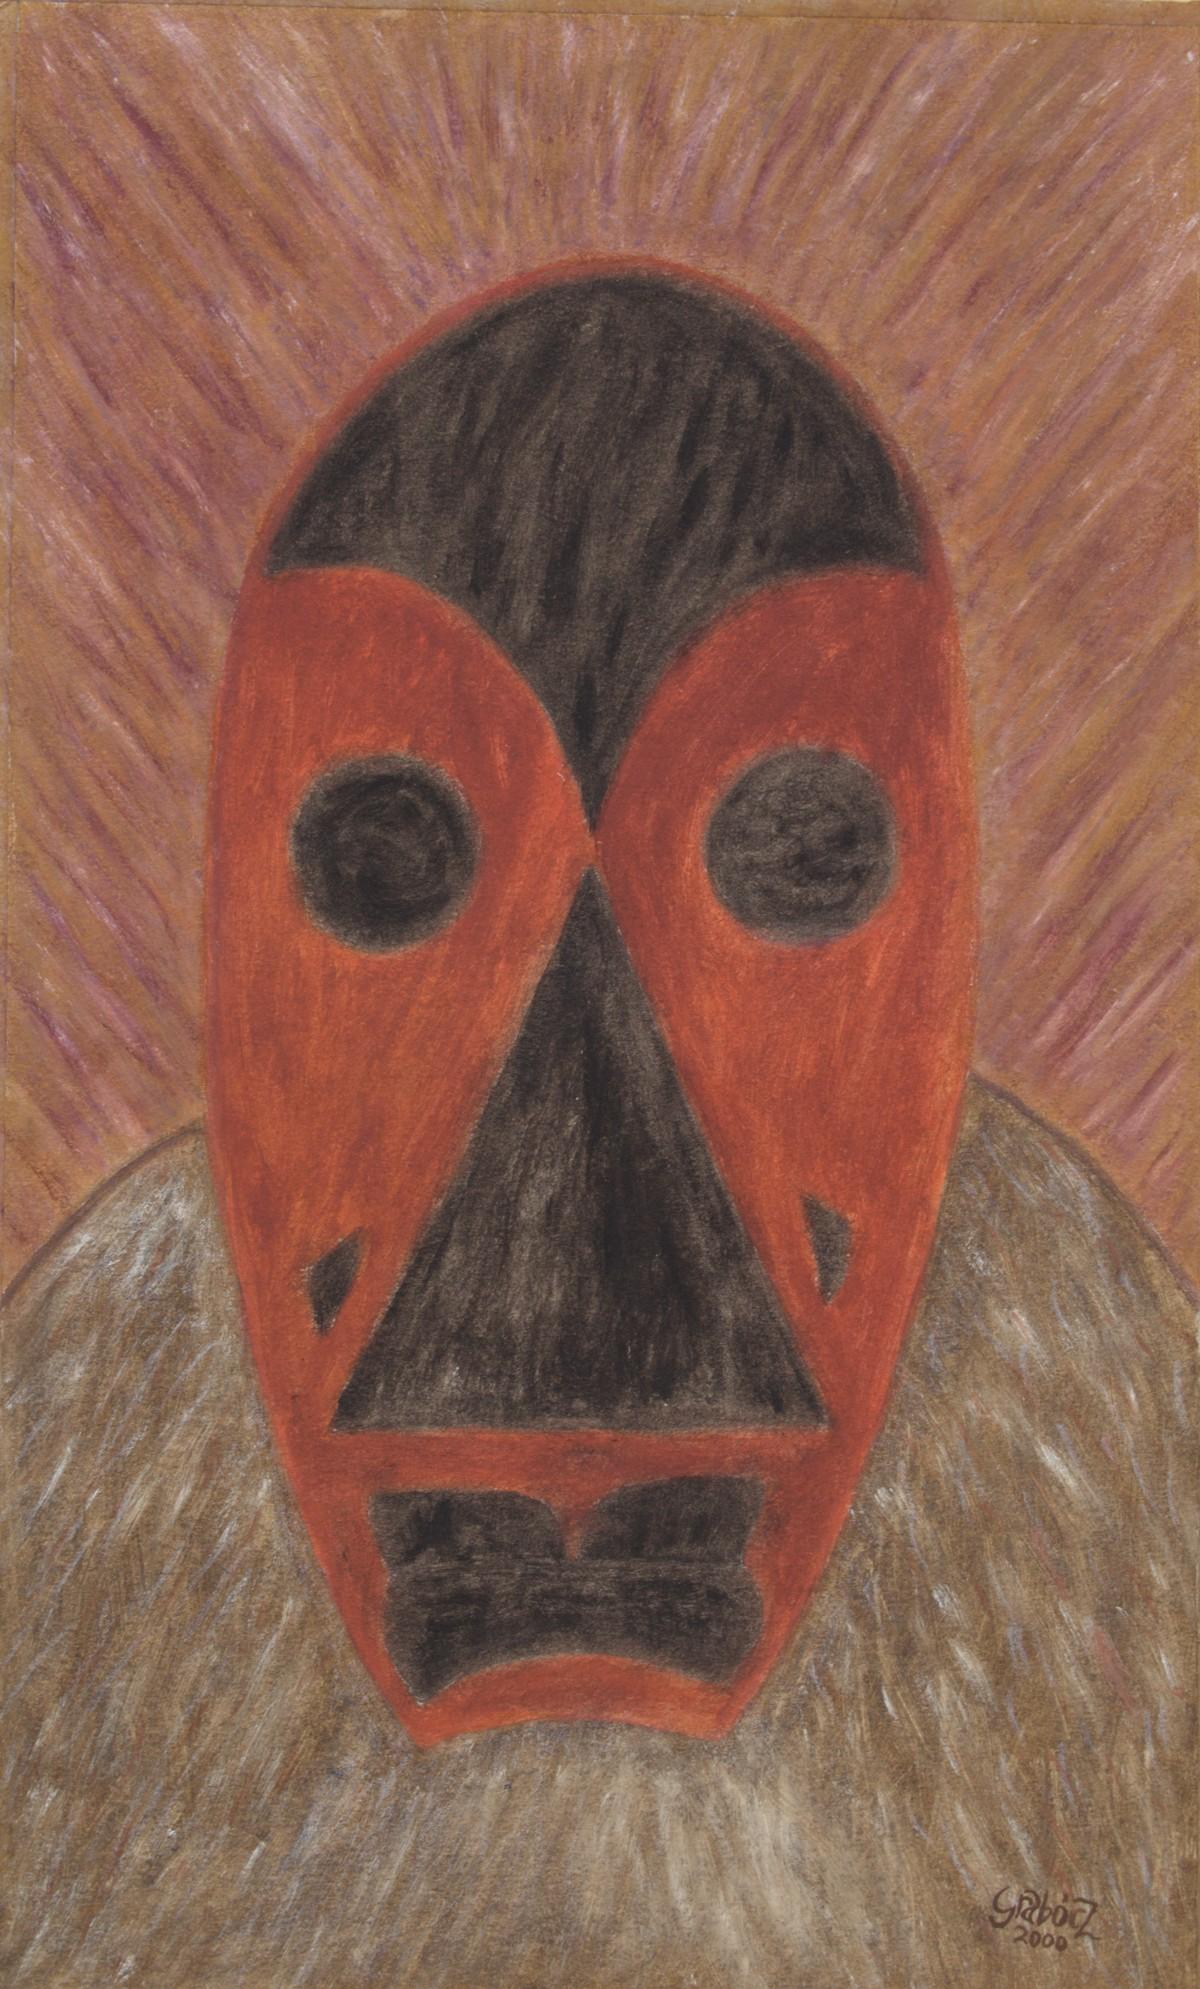 Firebug Mask (acrylic, cardboard, 30x49 cm), 2000